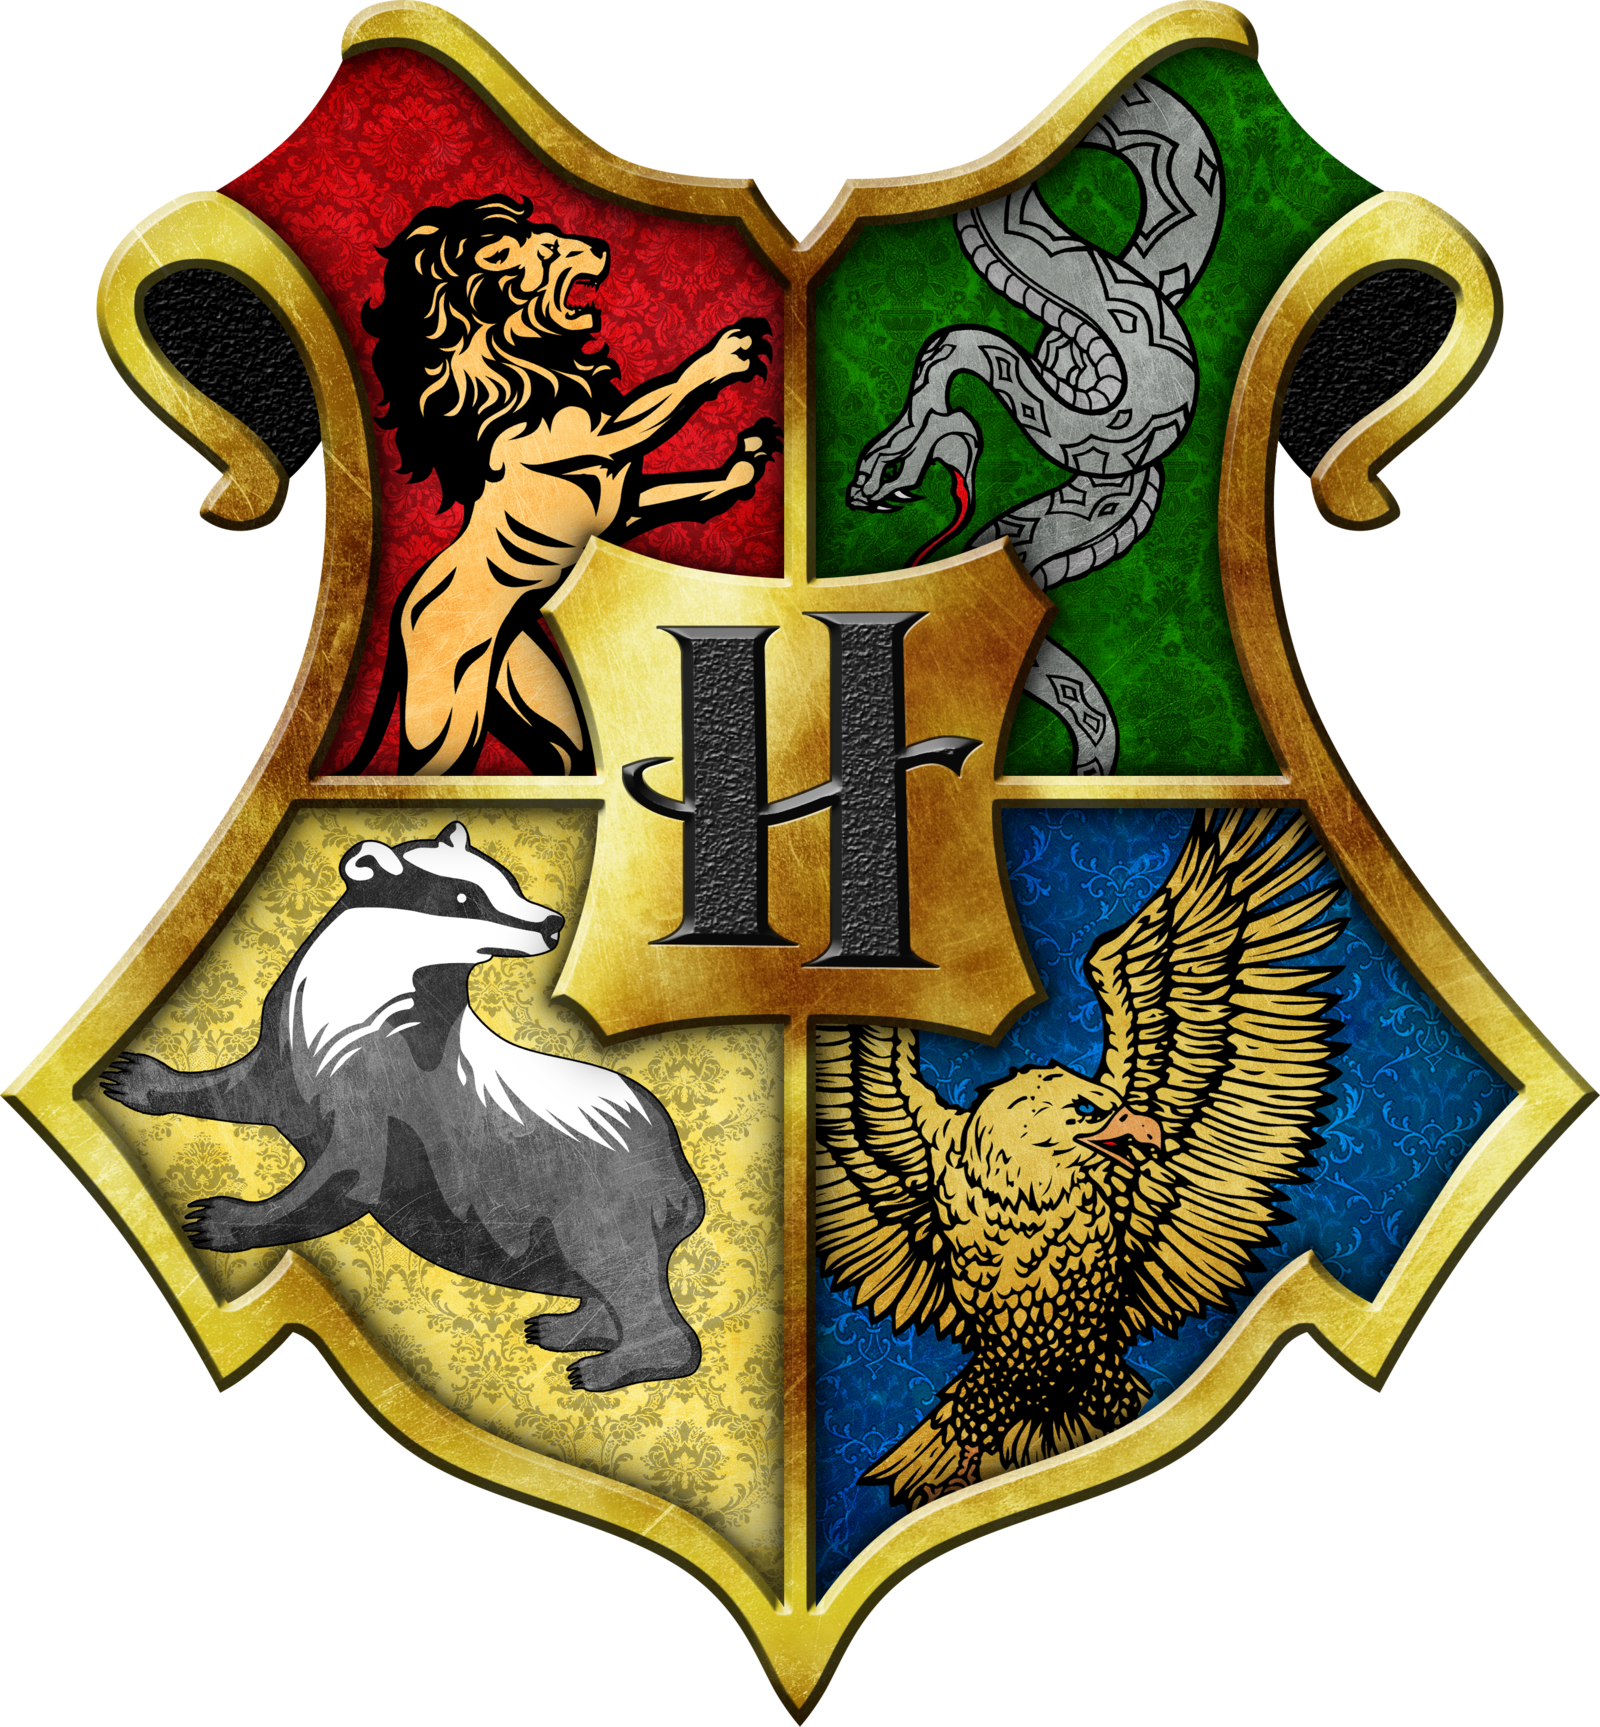 Risultati Immagini Per Hogwarts Logo Harry Potter Thema Hogwarts Wappen Hogwarts